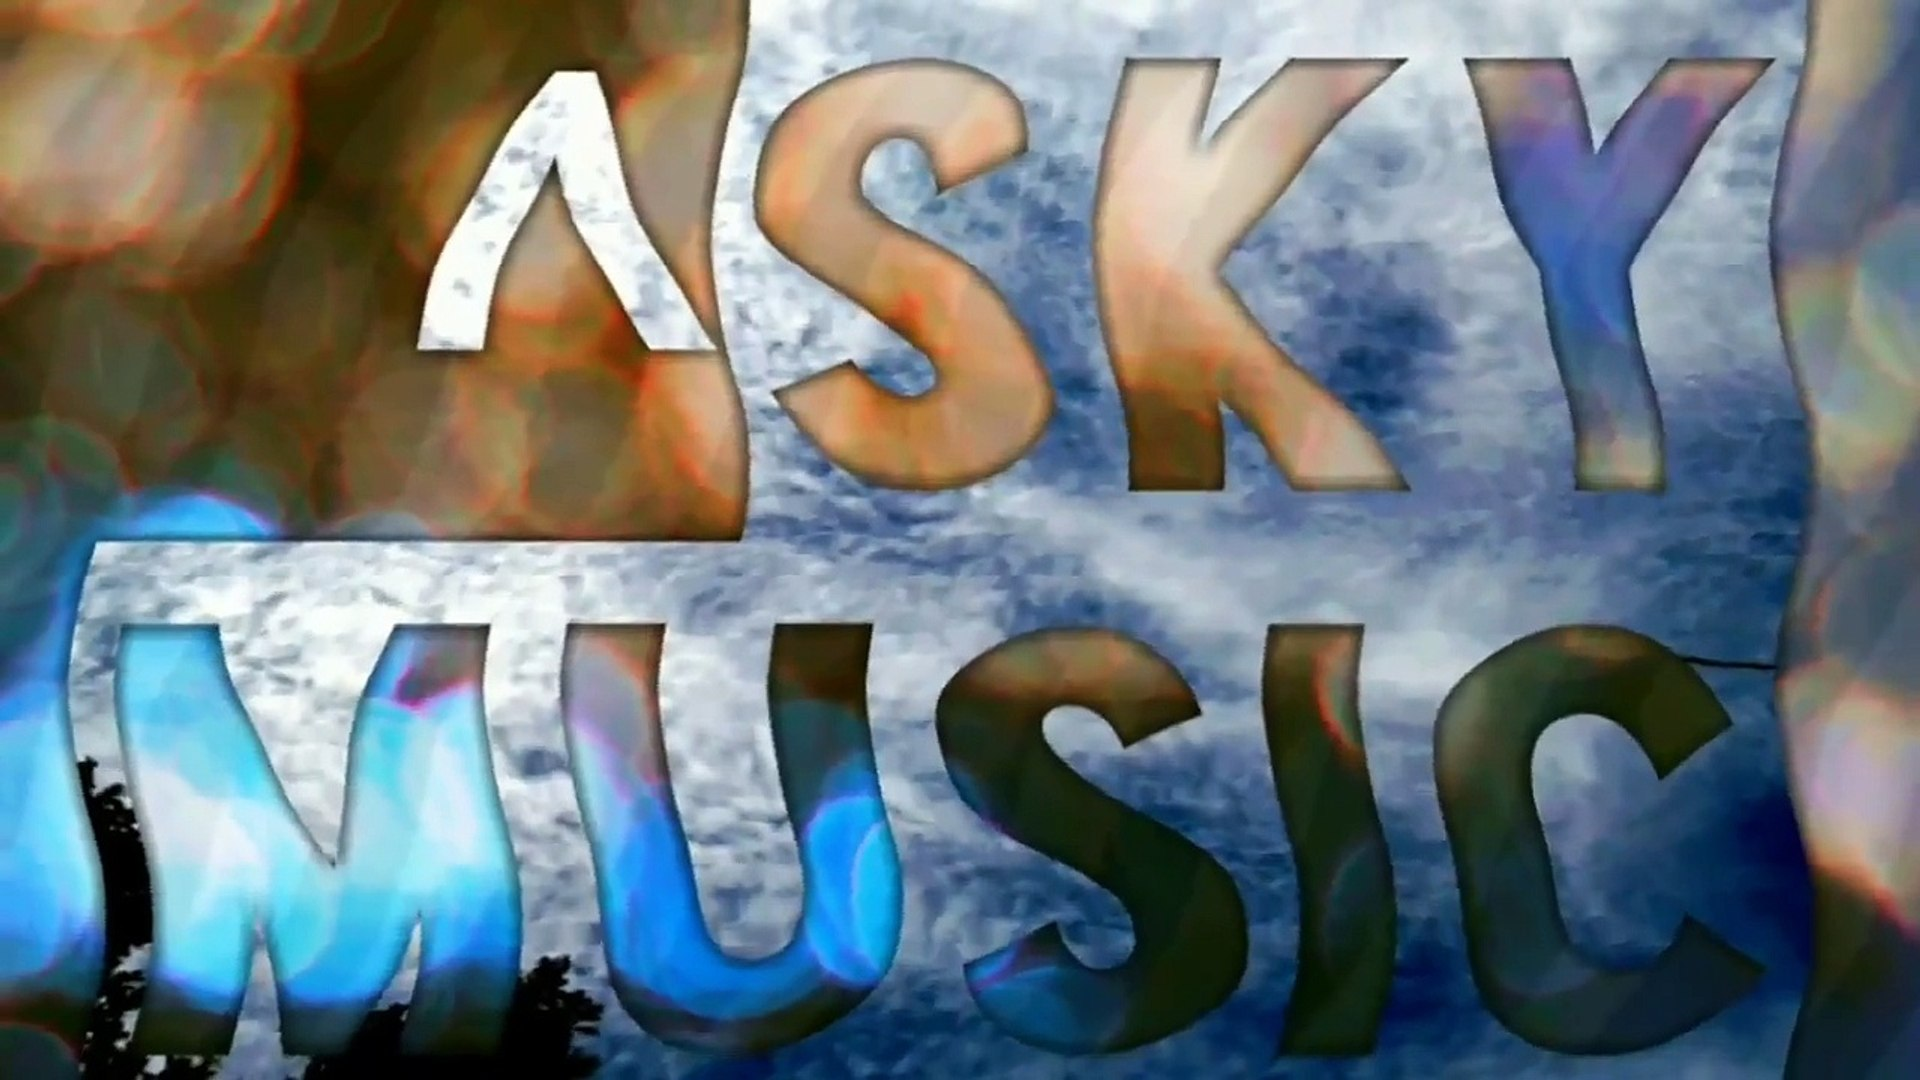 Dj Music Remix Sky Music